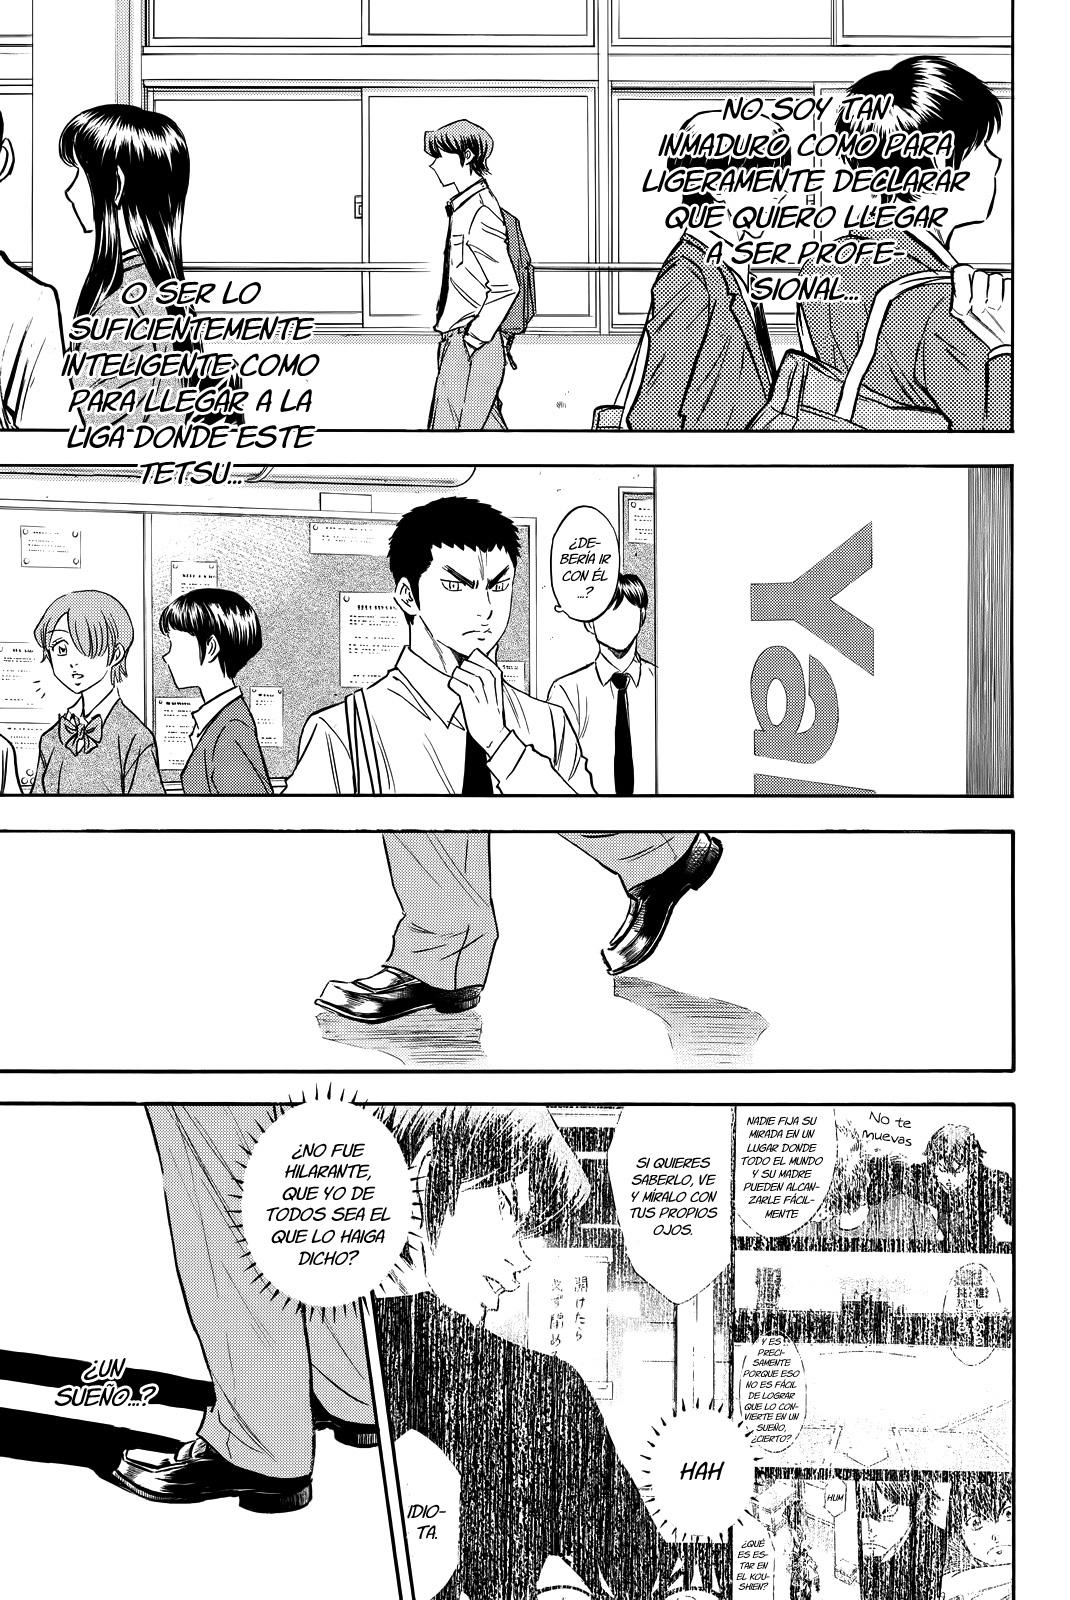 http://c5.ninemanga.com/es_manga/24/1752/416110/9117b58934e7639cd9a09be9db43fb7d.jpg Page 10